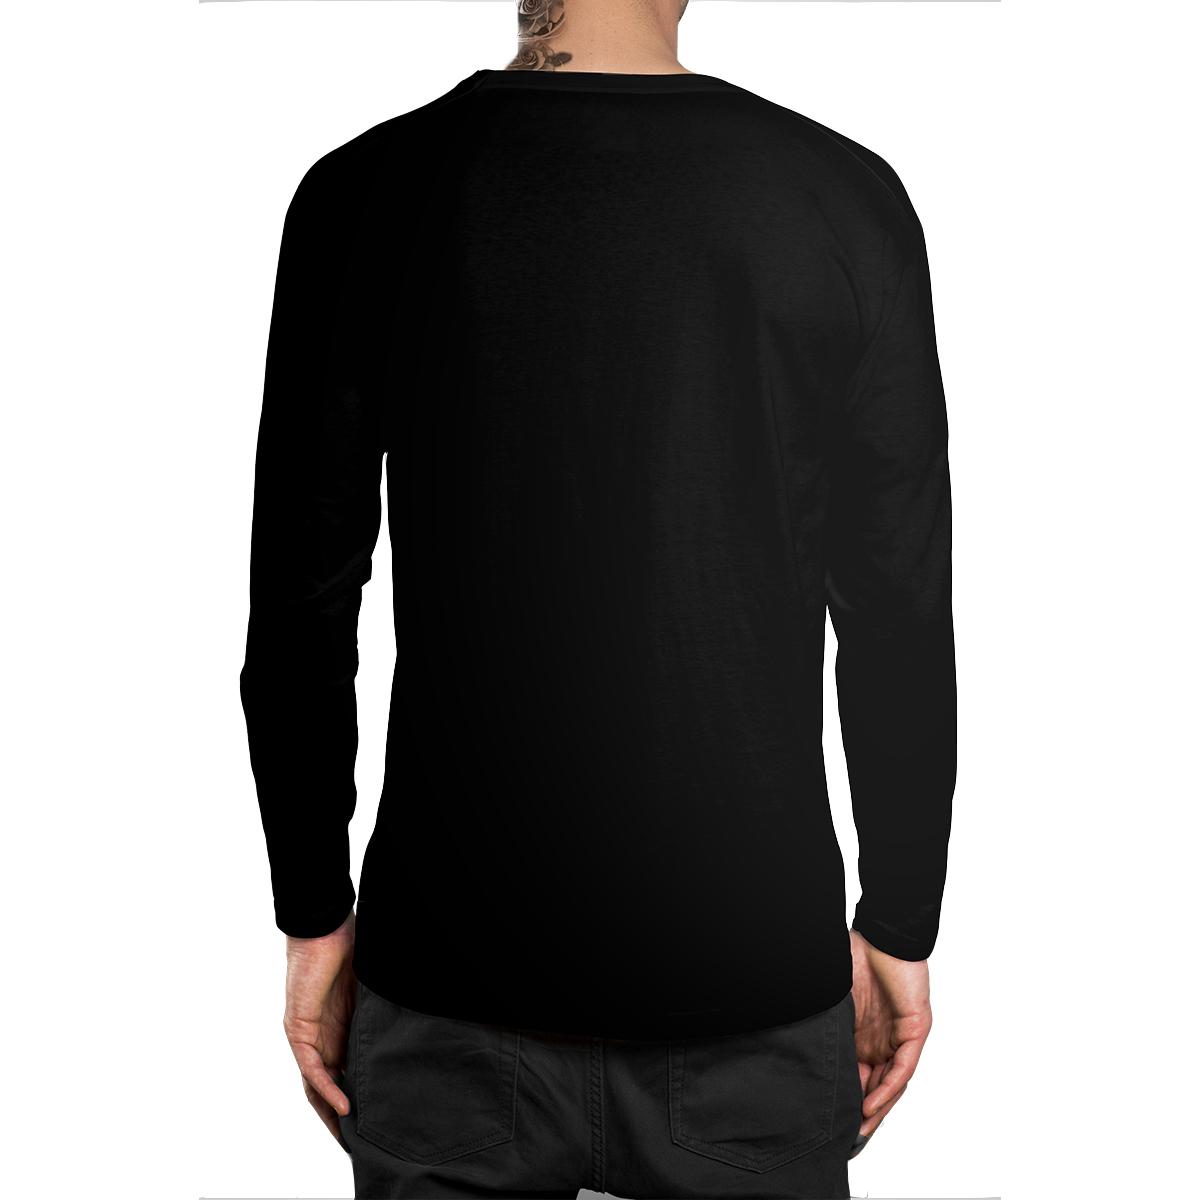 Stompy Camiseta Manga Longa Modelo 07